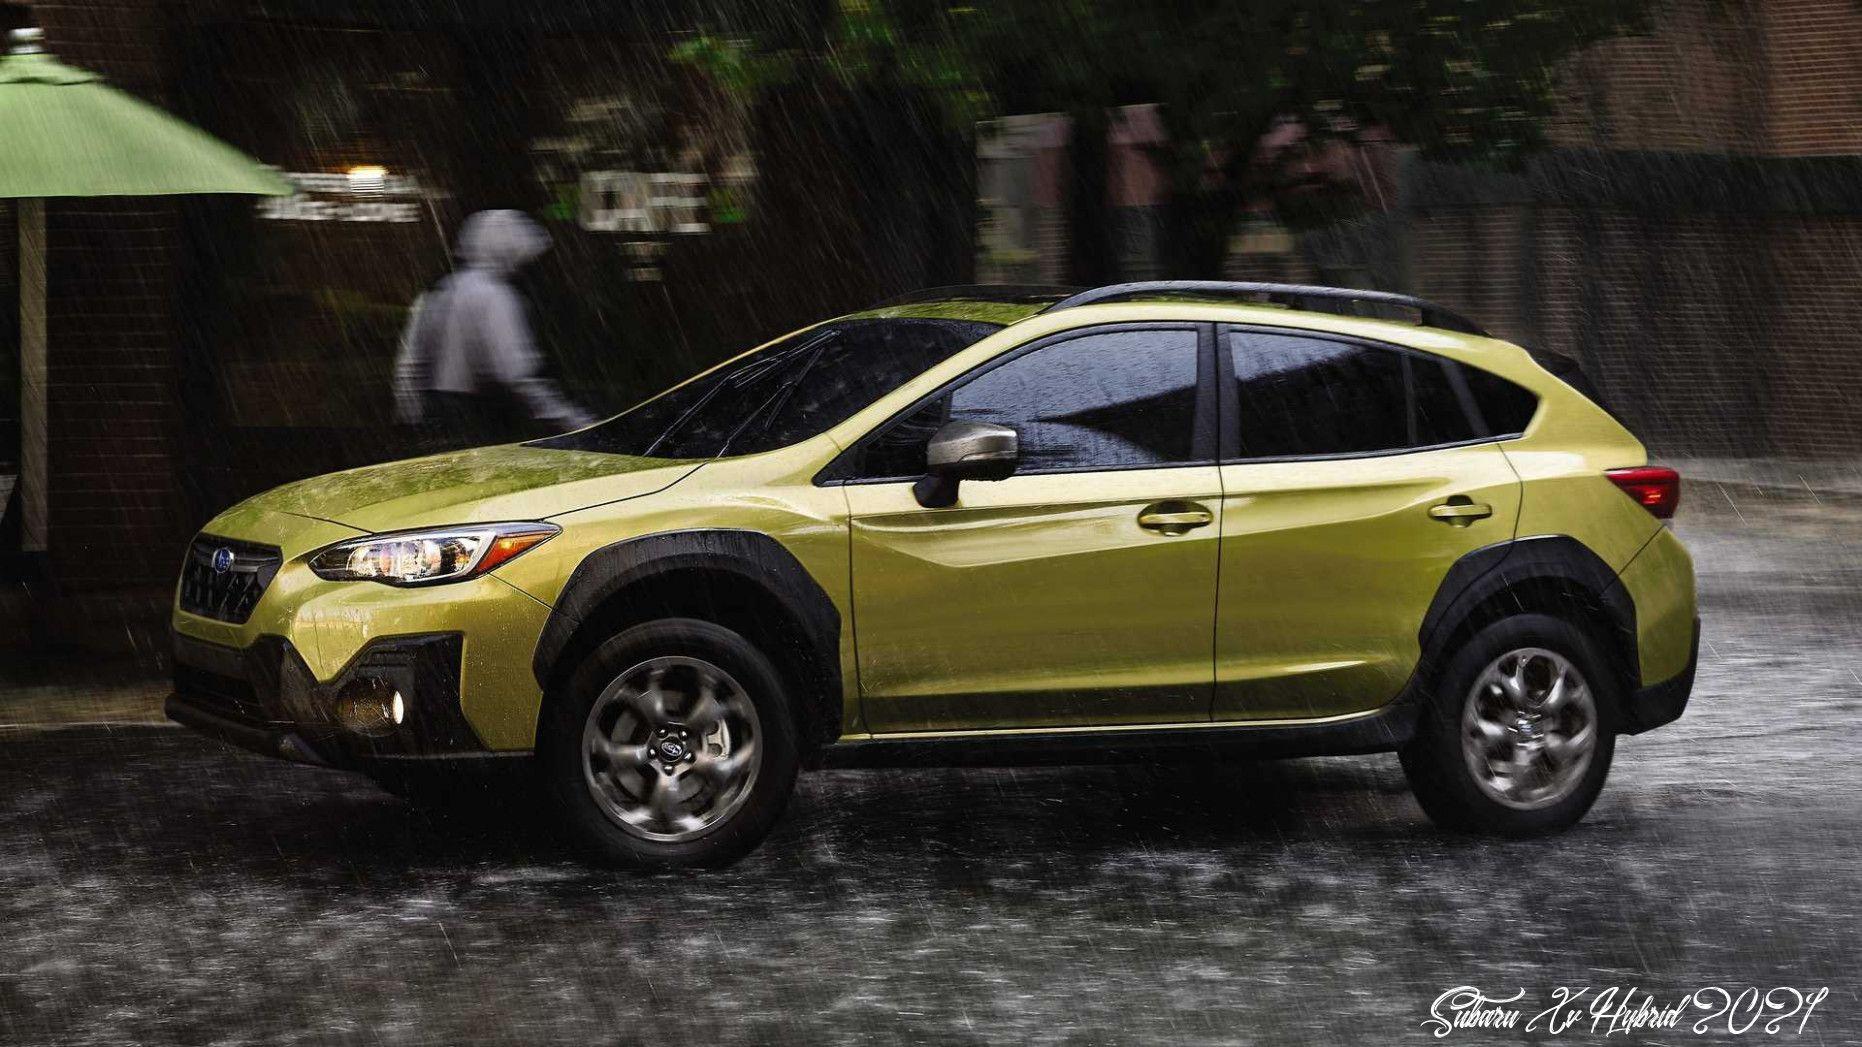 Subaru Xv Hybrid 2021 Pictures In 2020 Subaru Crosstrek Sports Models Subaru